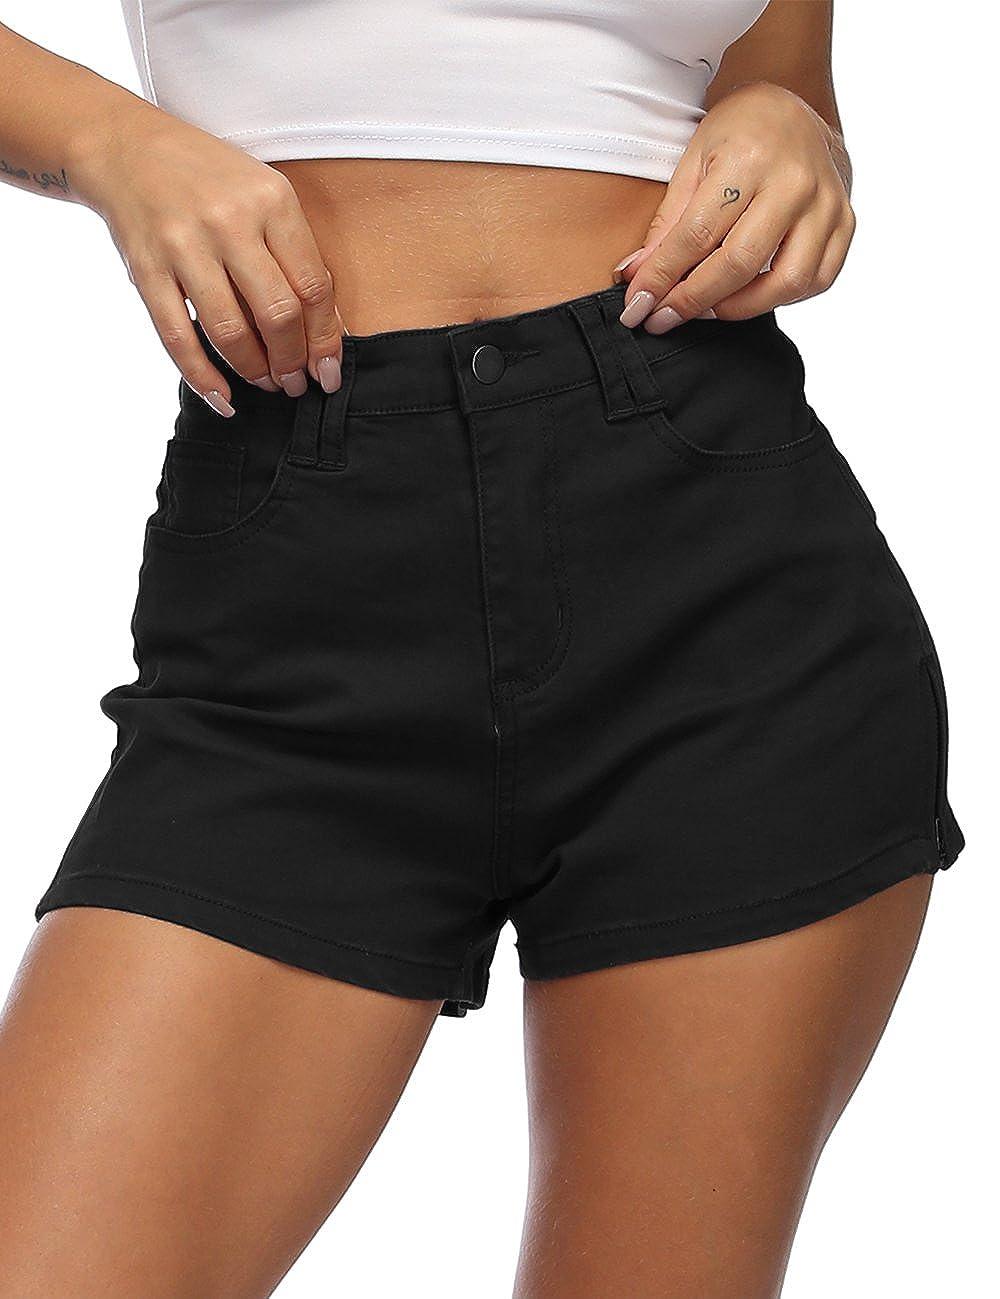 Black Cuihur Women's Juniors Casual Split High Waist Denim Jeans Shorts